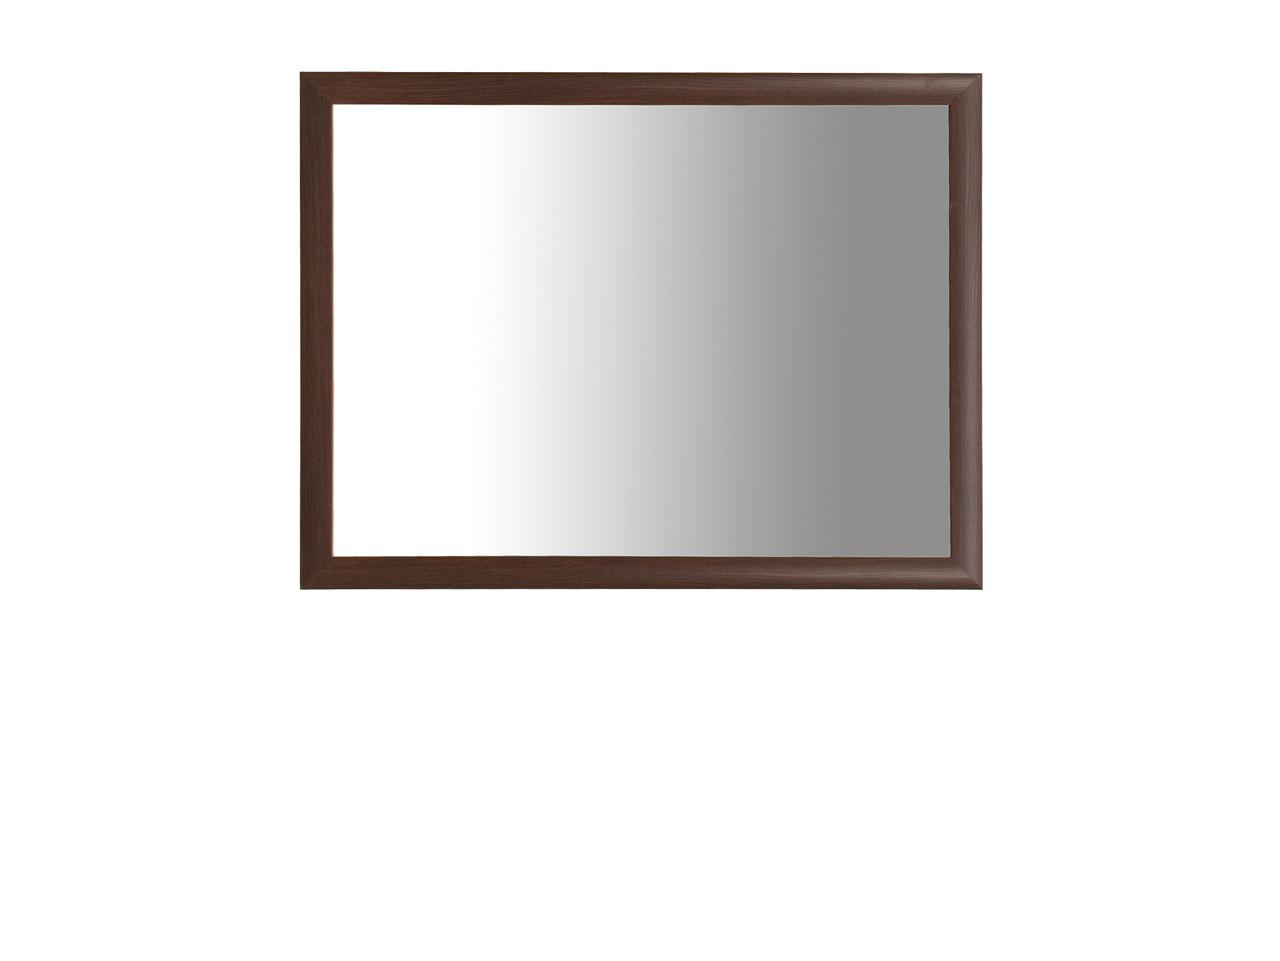 Зеркало панель, коллекции Коен, Венге Магия, БРВ Брест (Беларусь)